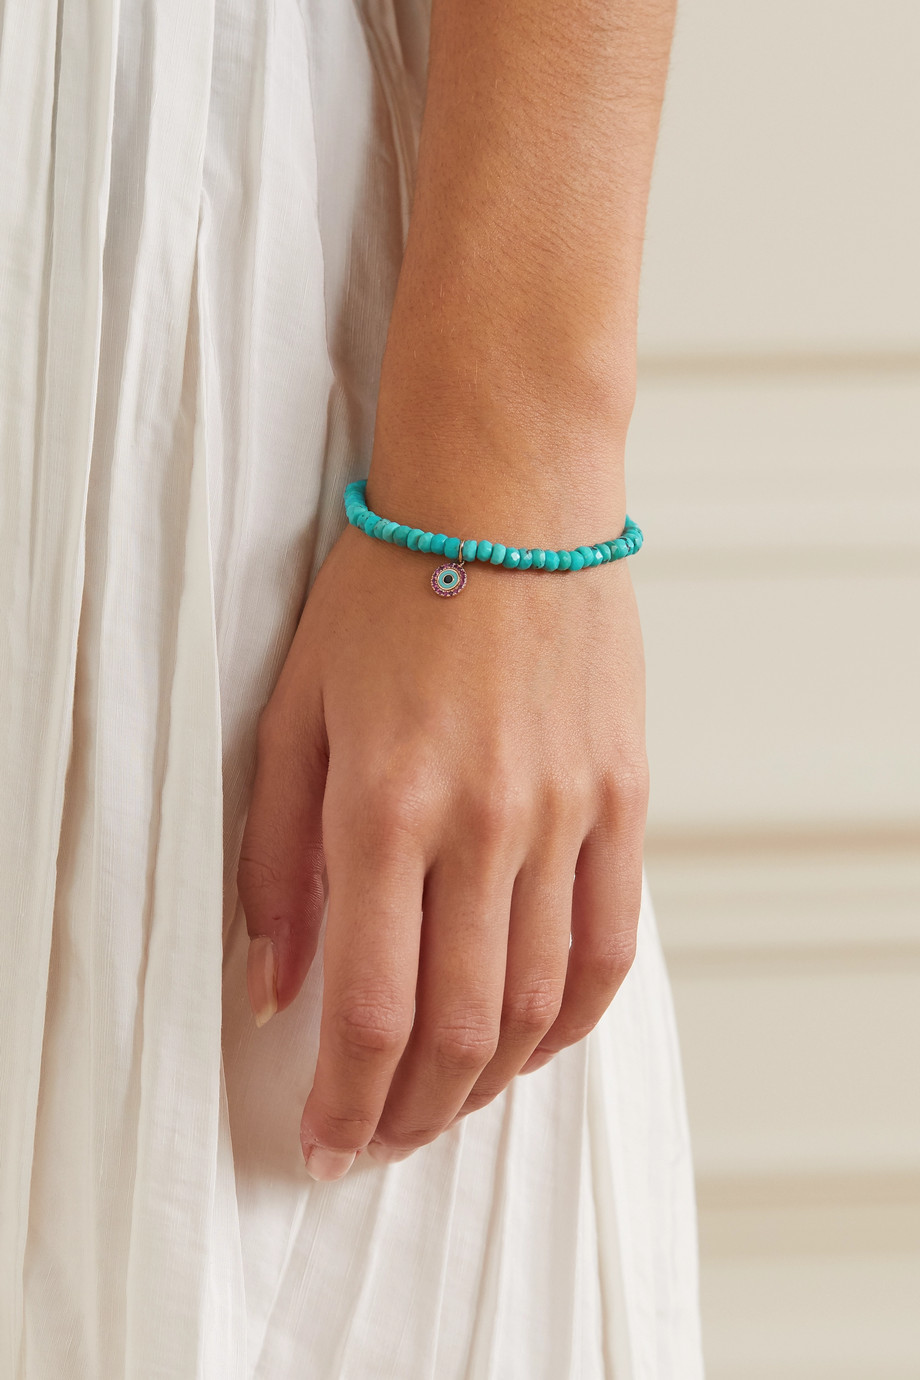 Sydney Evan Evil Eye 14-karat gold, enamel, turquoise and ruby bracelet